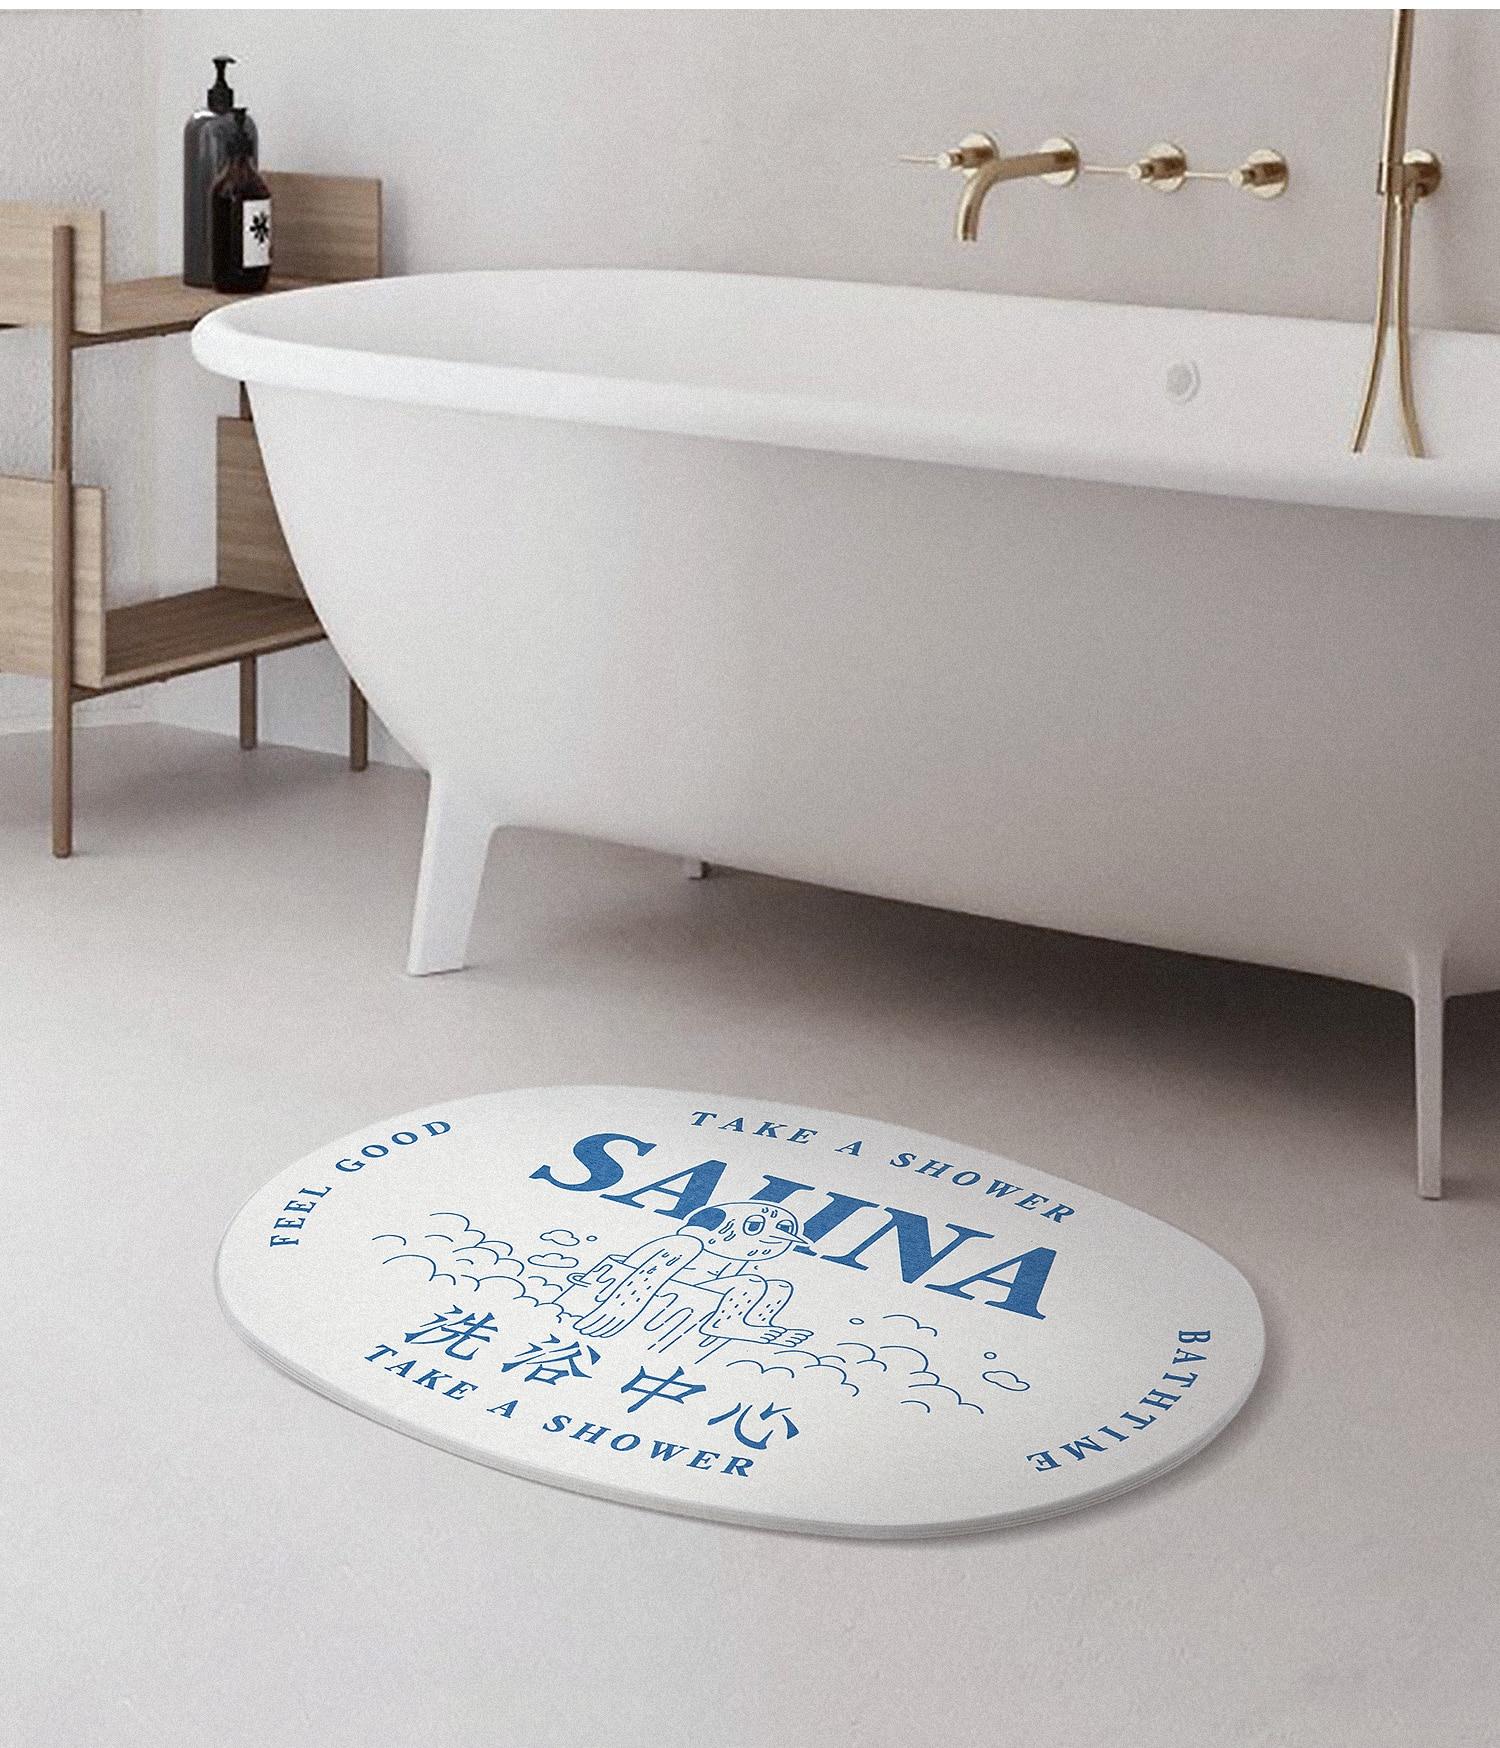 Modern Mat For Bathroom Floor Carpets Diatom Warm Shower Non Slip Bath Mats Floor Doormat Salle De Bain Bathroom Product DH50DD